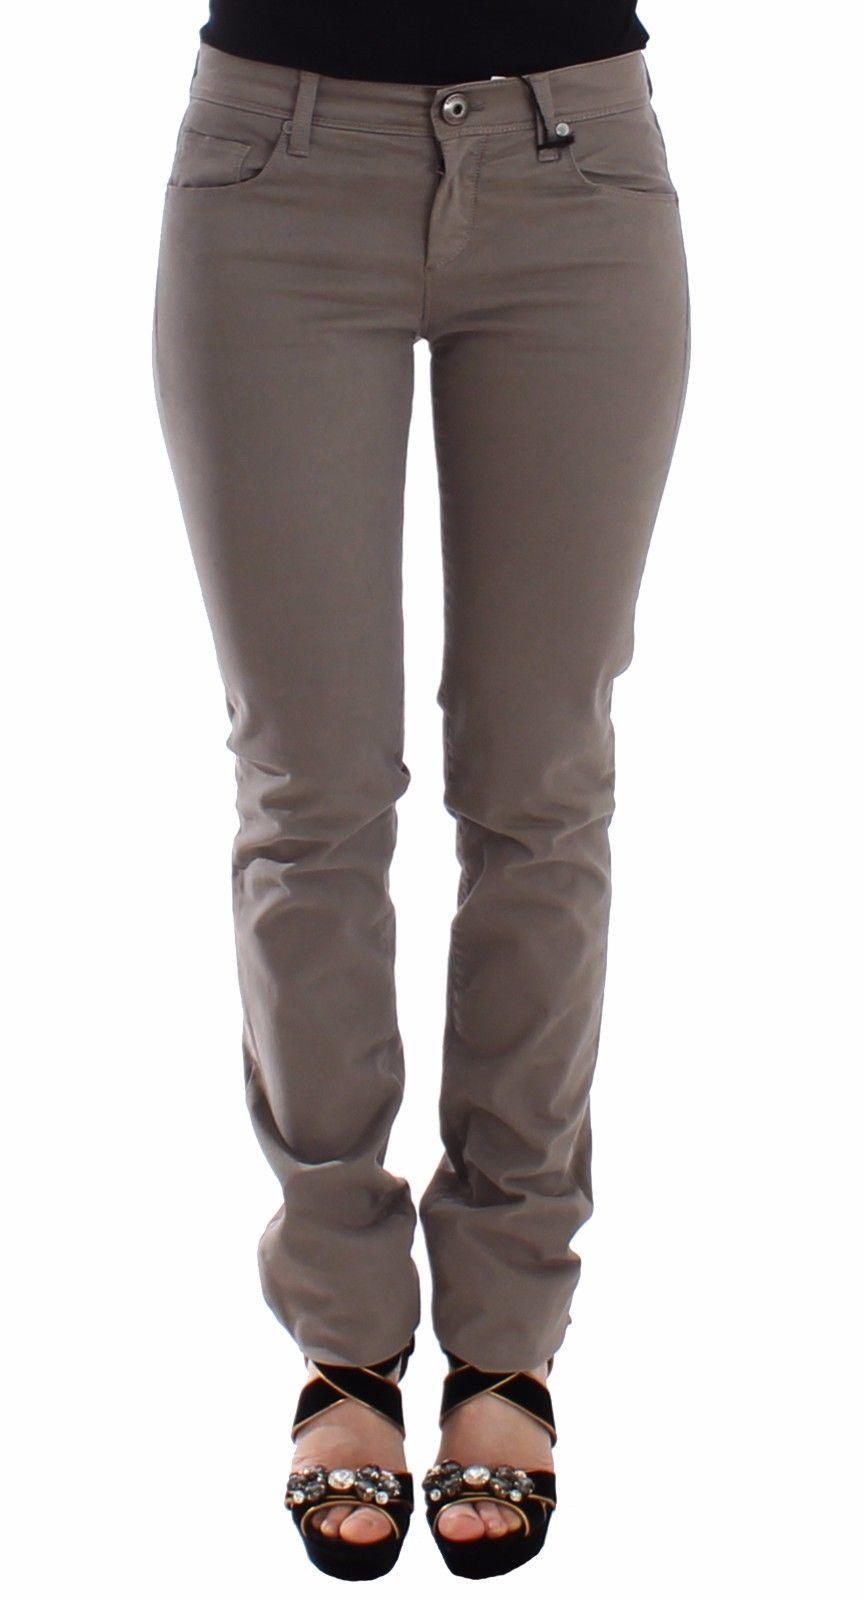 Ermanno Scervino Taupe Beige Slim Jeans Denim Pants Skinny